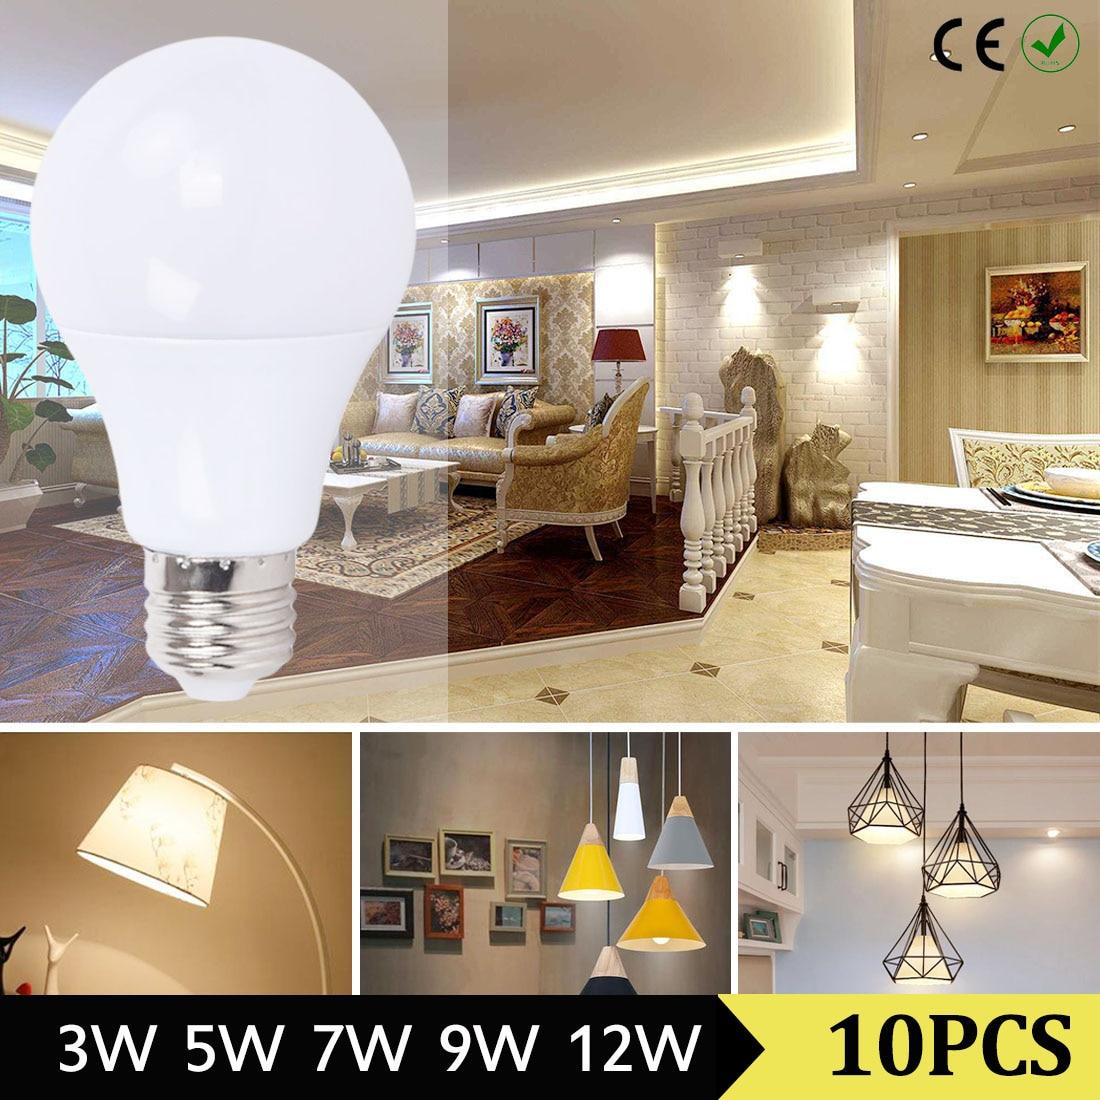 10pcs LED Bulb Lamps 3W 5W 7W 9W 12W E27 Light Bulb Smart IC Real Power High Brightness Lampada LED Bombillas